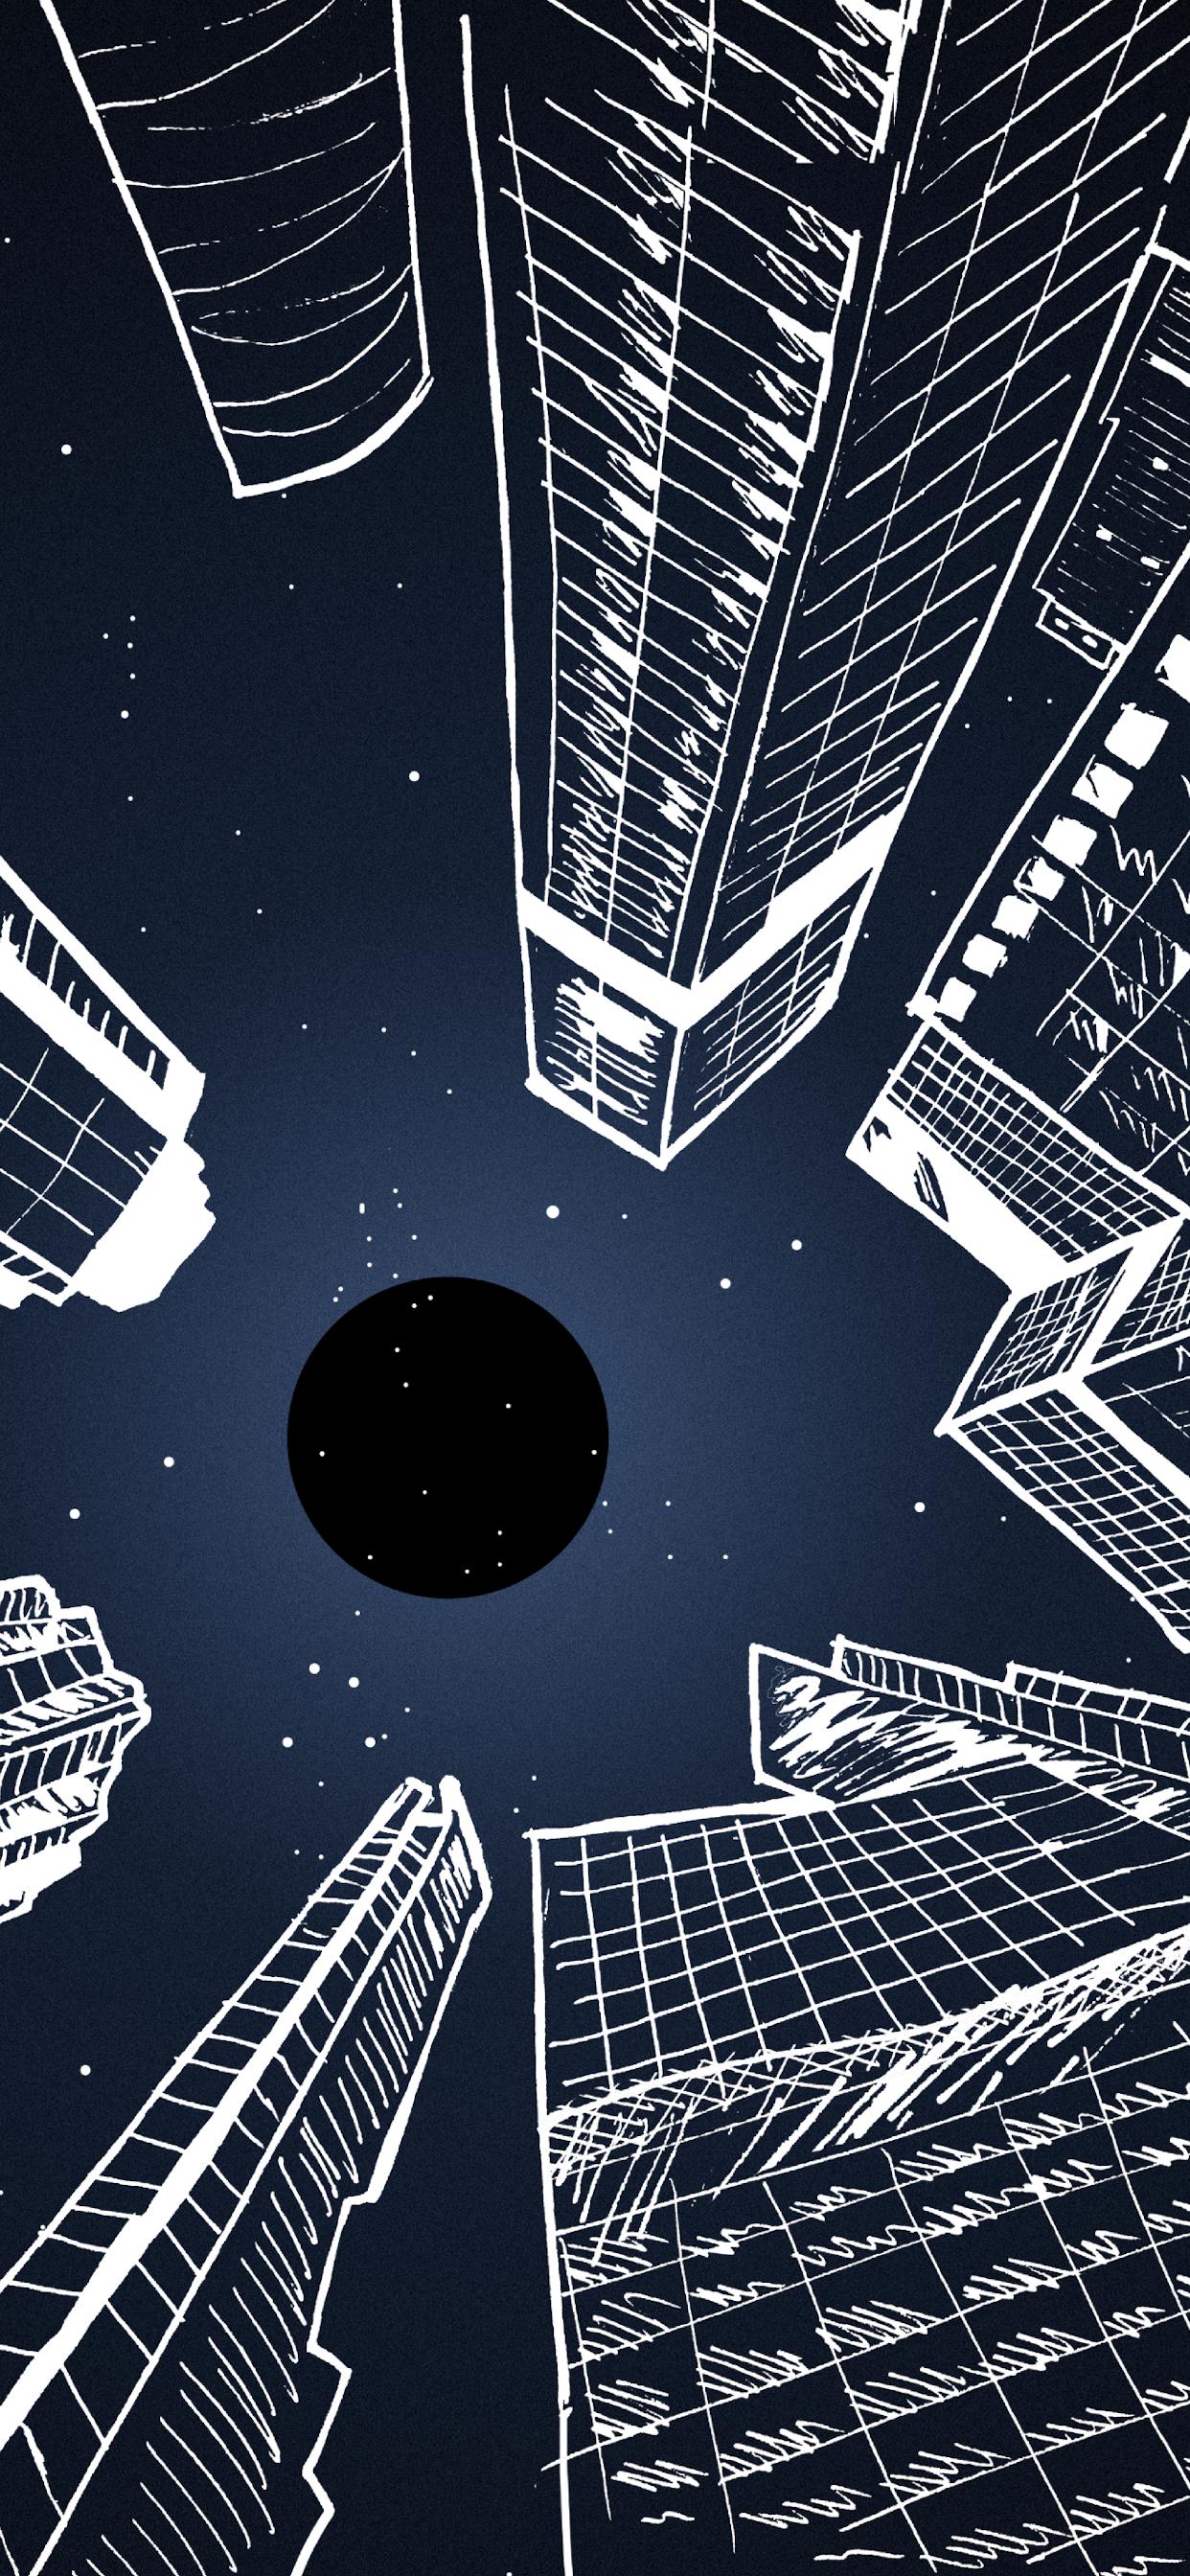 iPhone wallpapers illustration city night sky Fonds d'écran iPhone du 14/10/2019